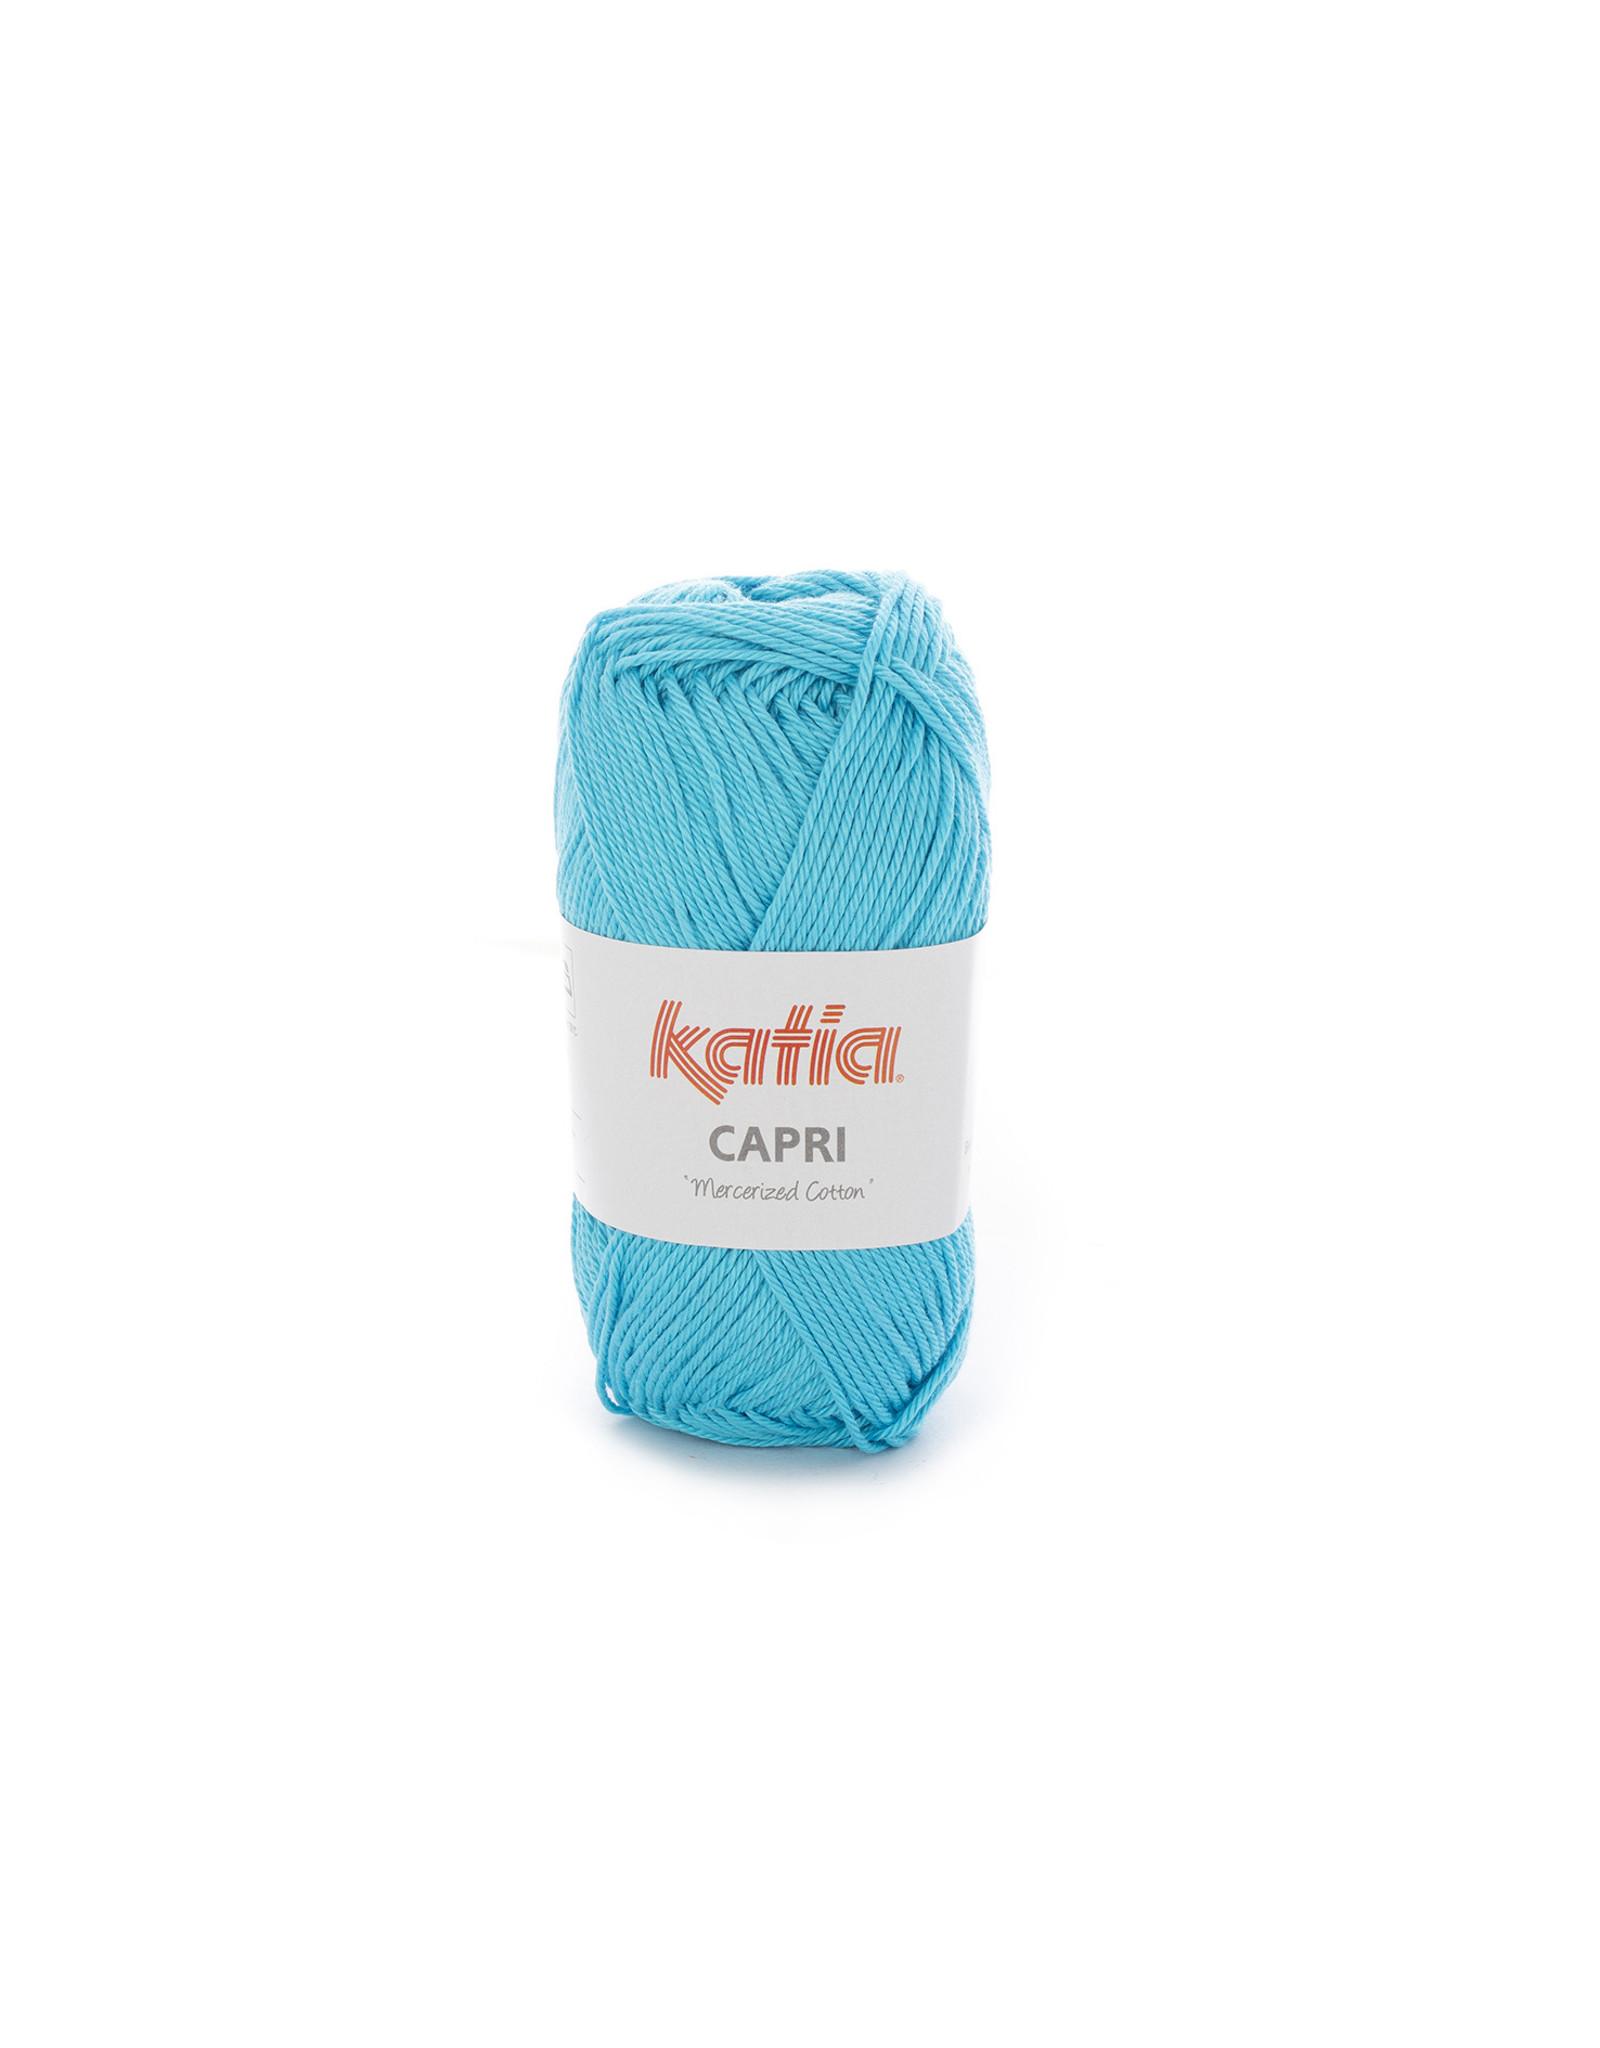 Katia Katia Capri - kleur 101 Turquoise - bundel 5 x 50 gr. / 125 m. - 100% katoen